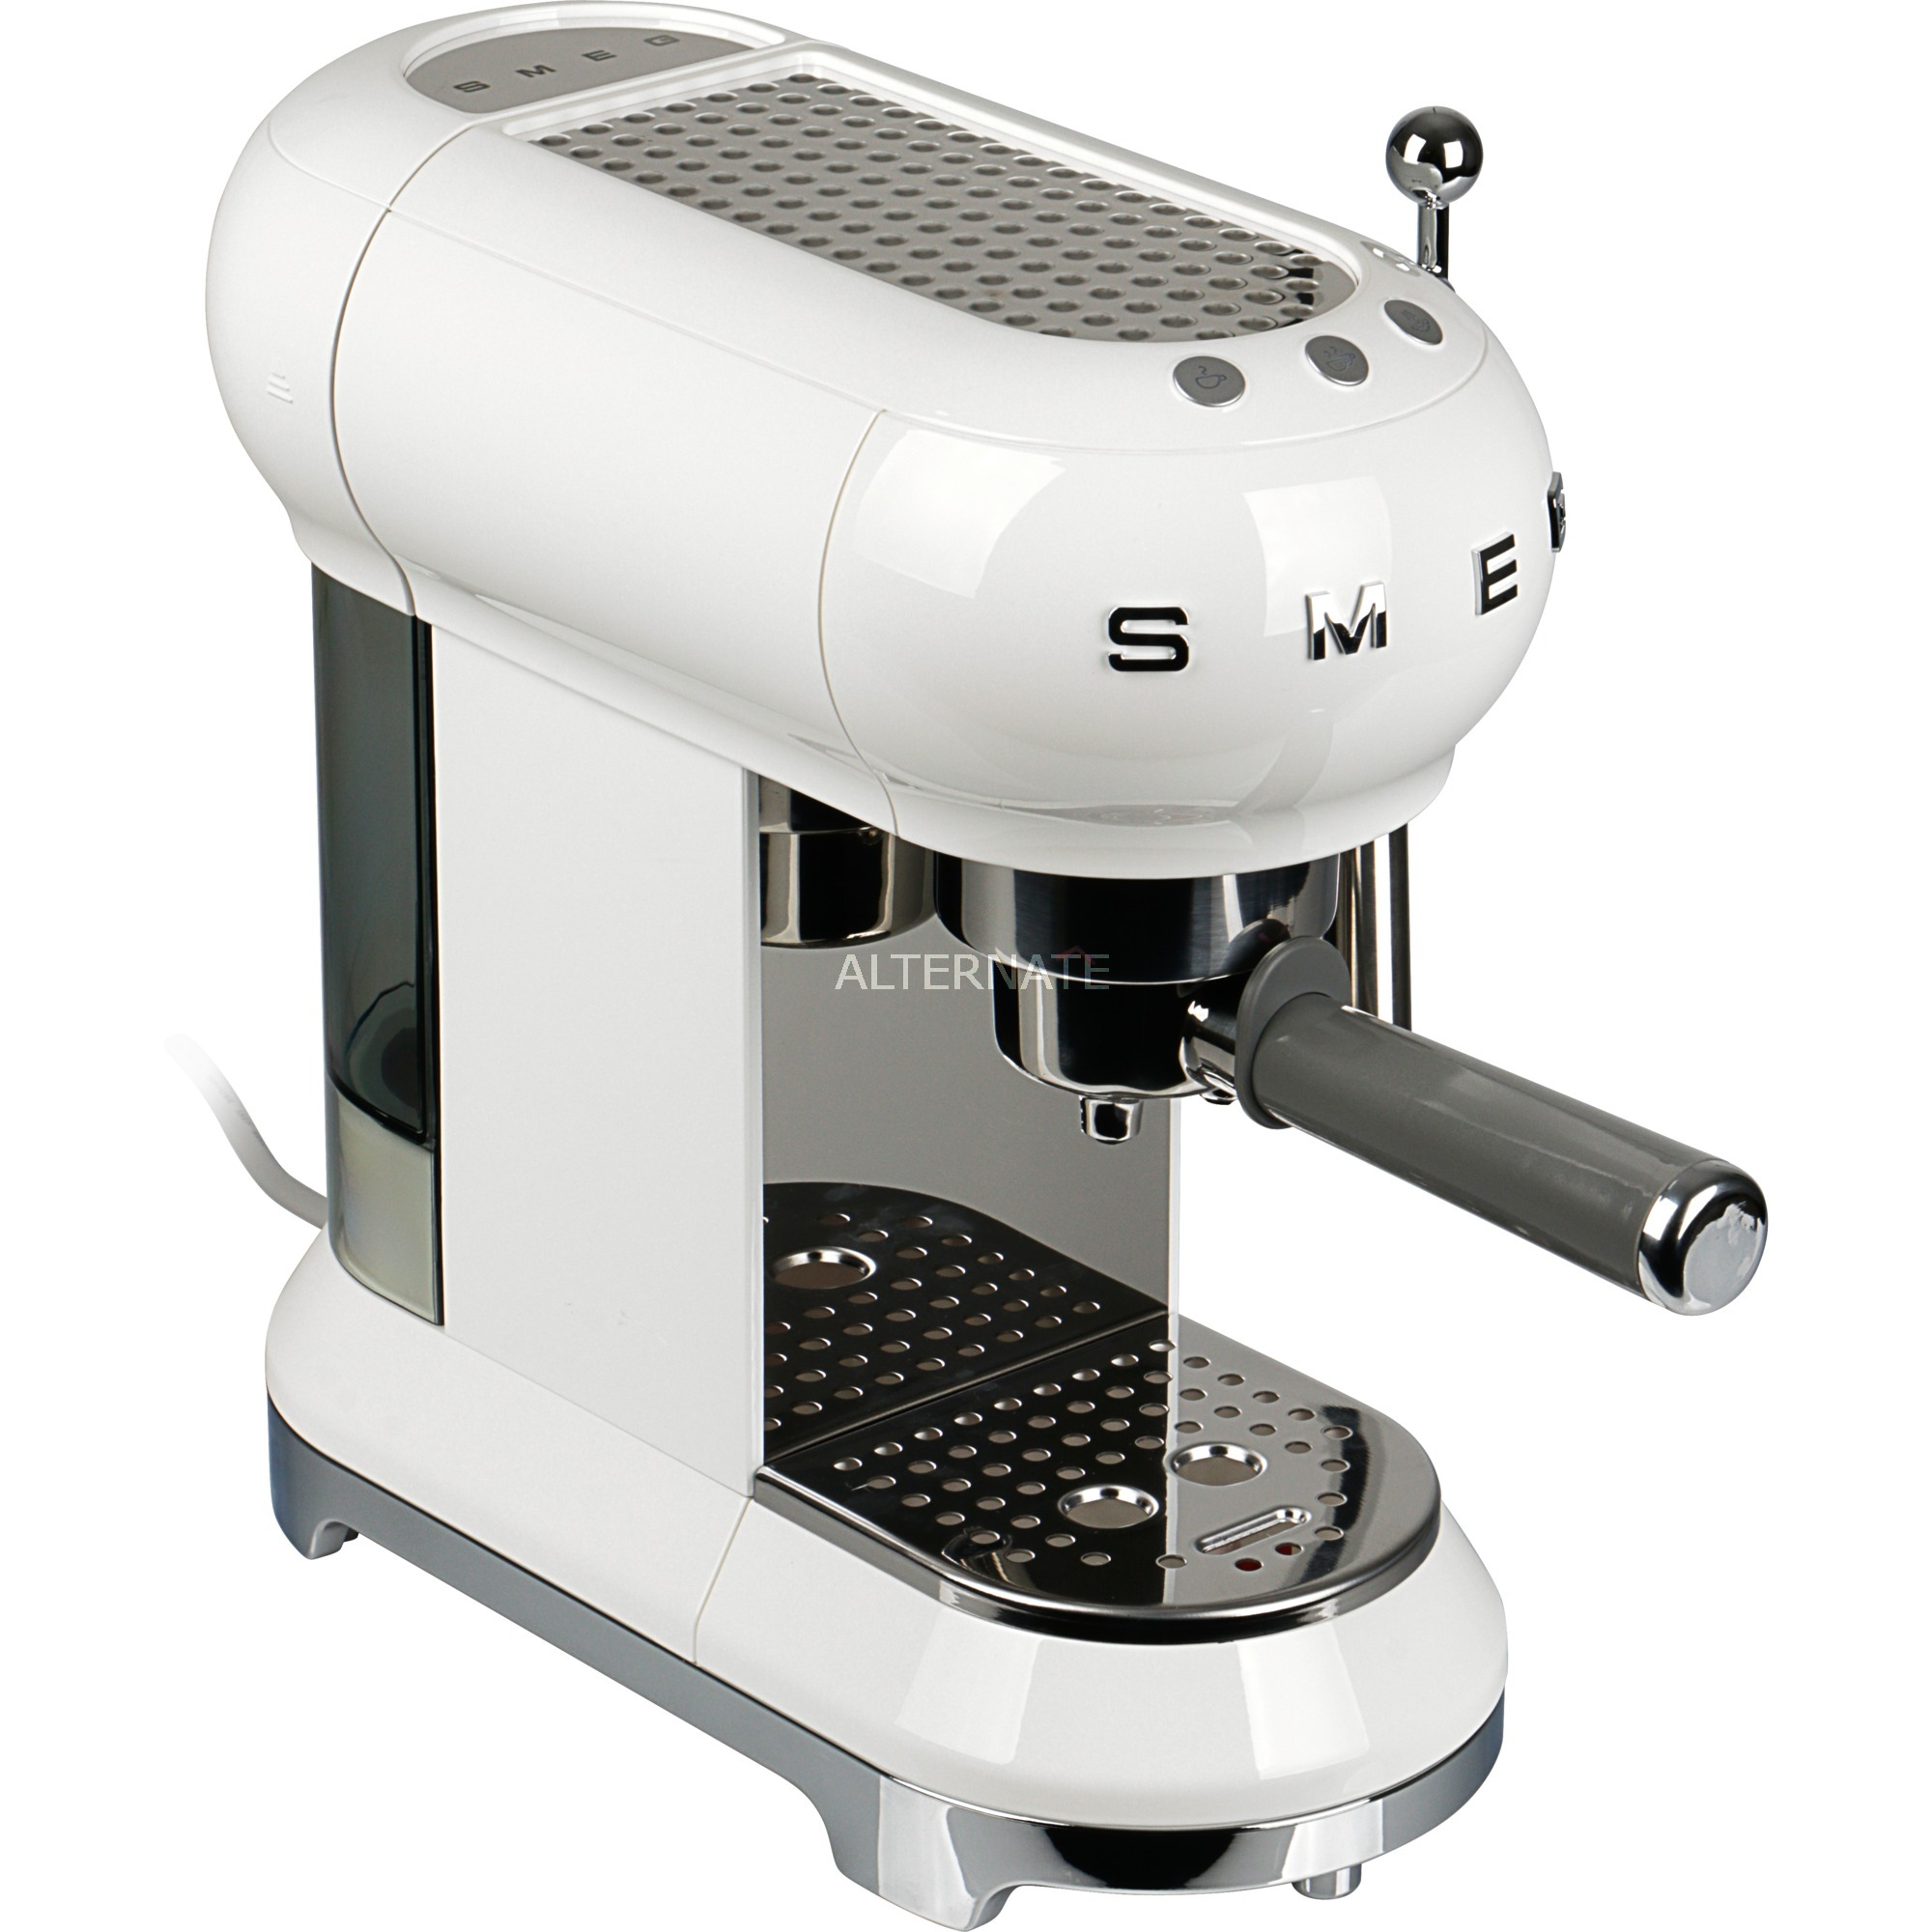 ECF01WHEU cafetera eléctrica Encimera Máquina espresso 1 L Semi-automática, Cafetera espresso